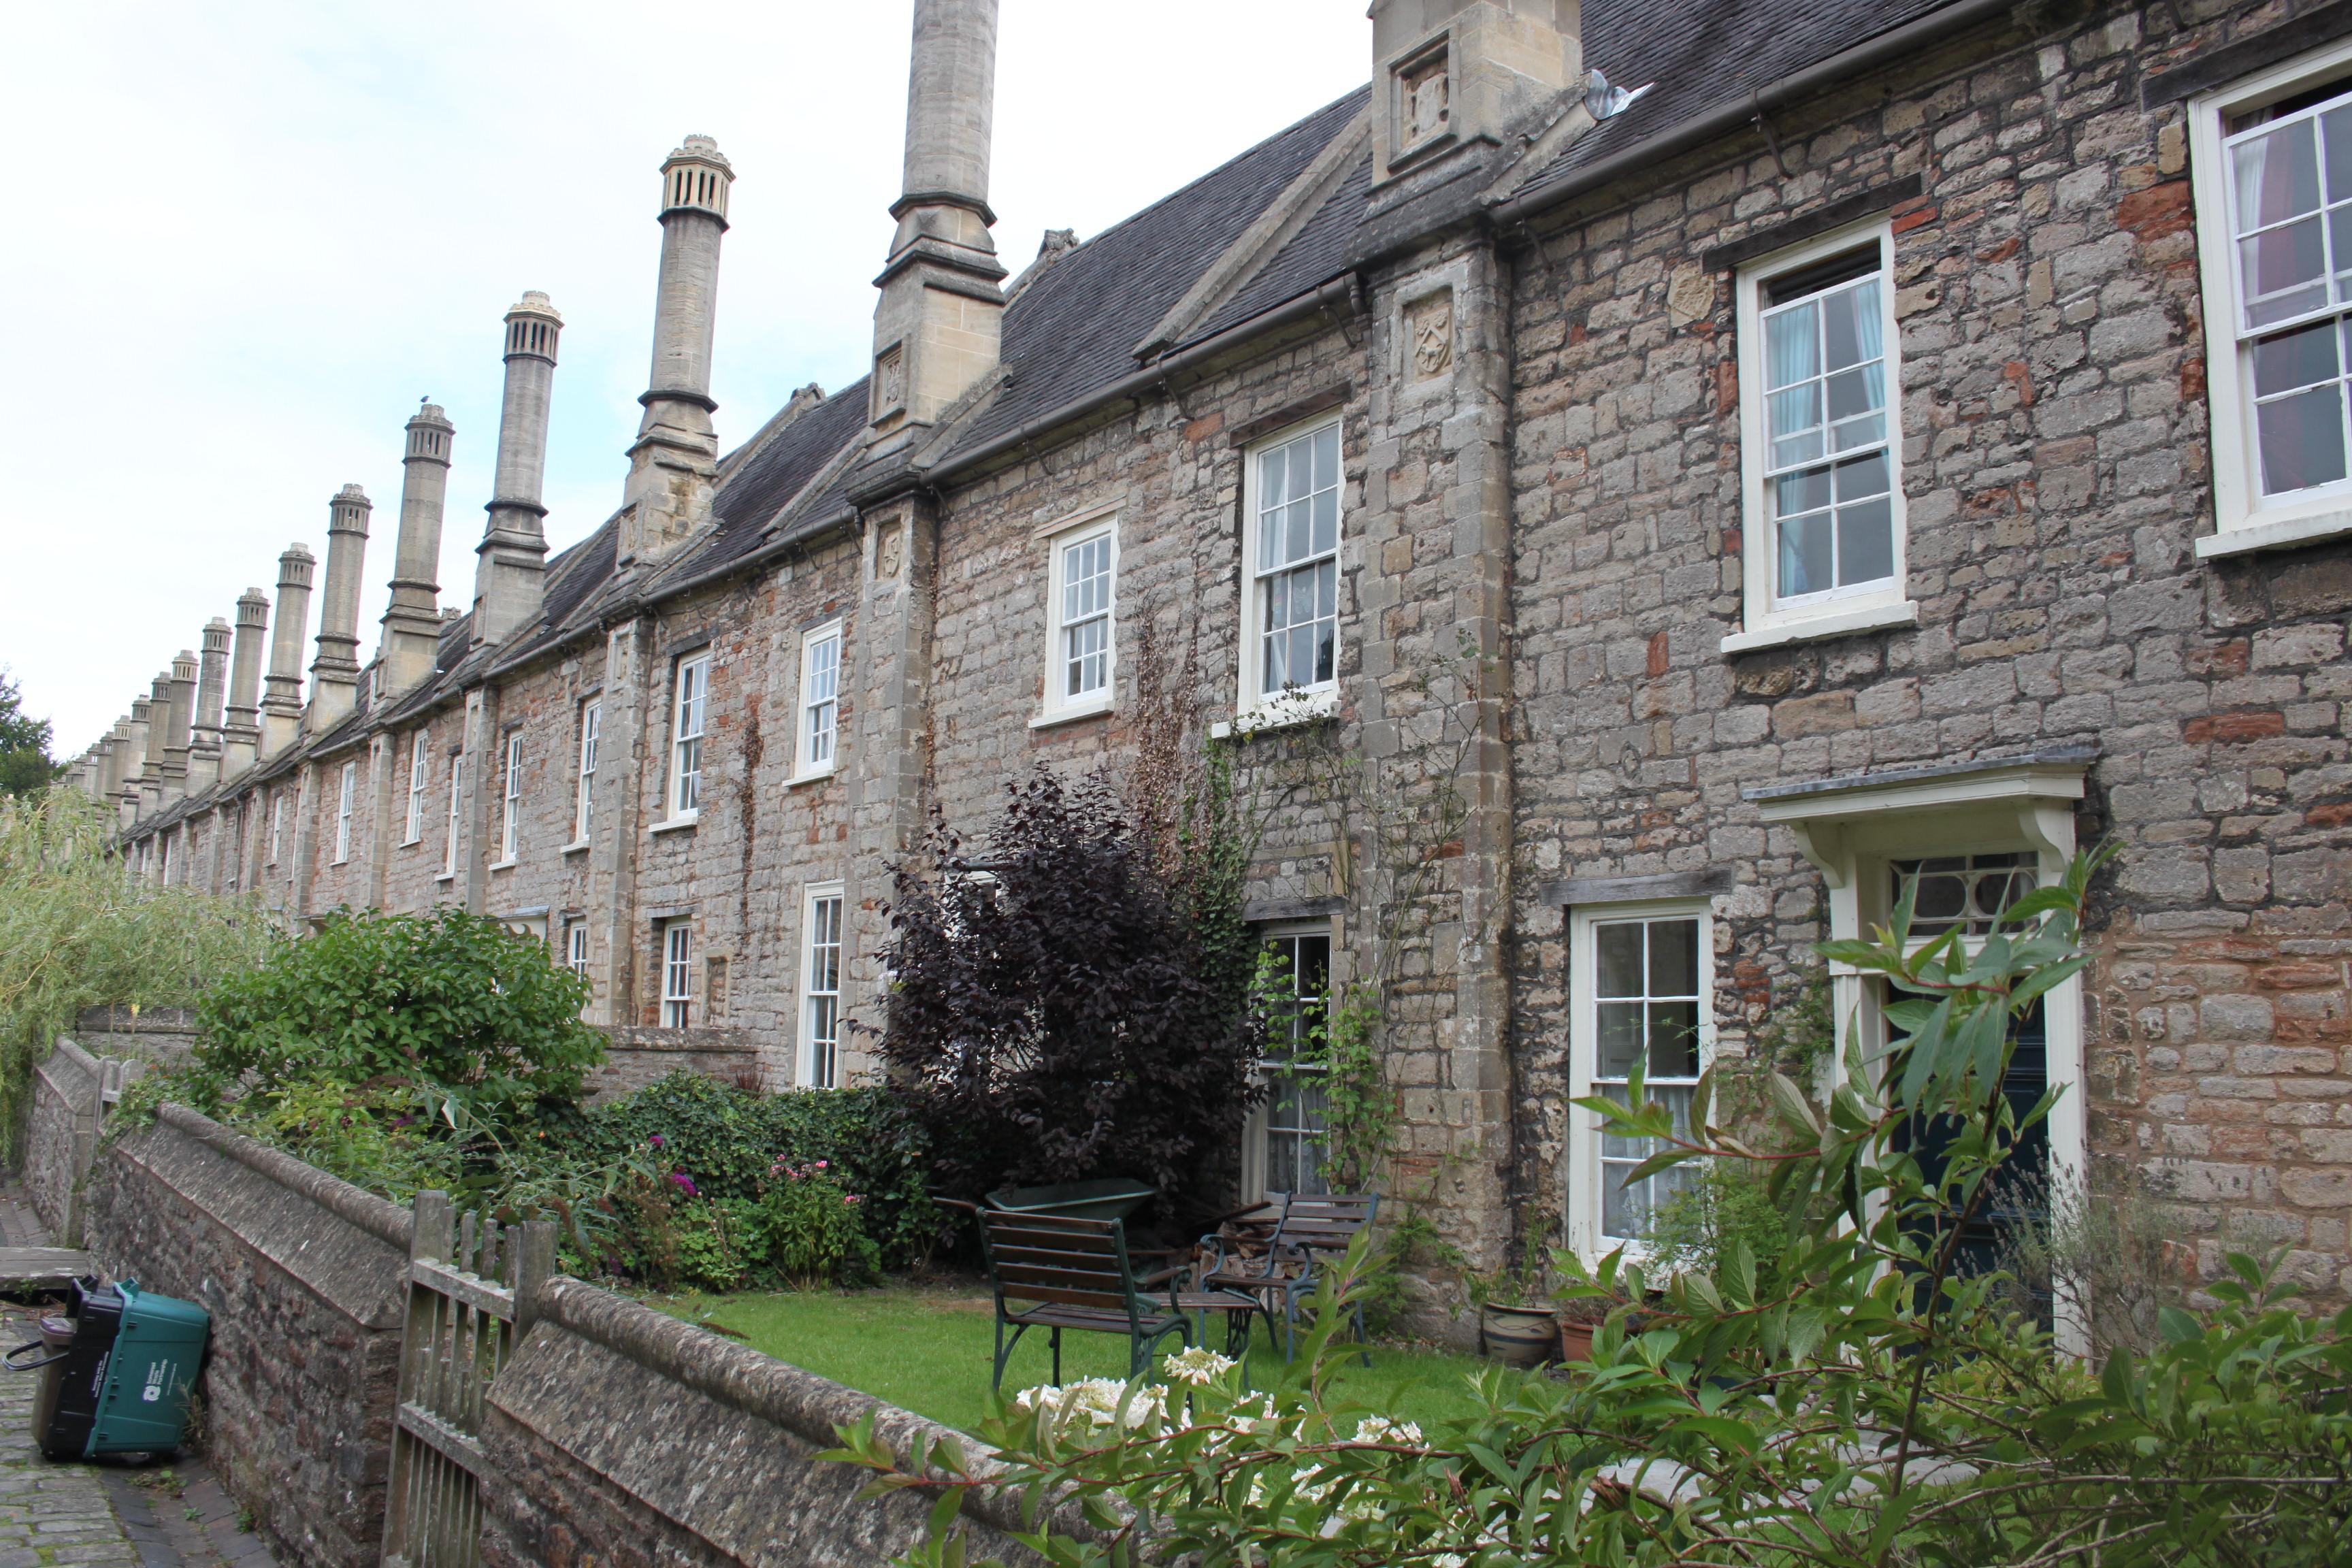 Vicars' Close, Wells, Somerset (UK). Rodw / Rodw